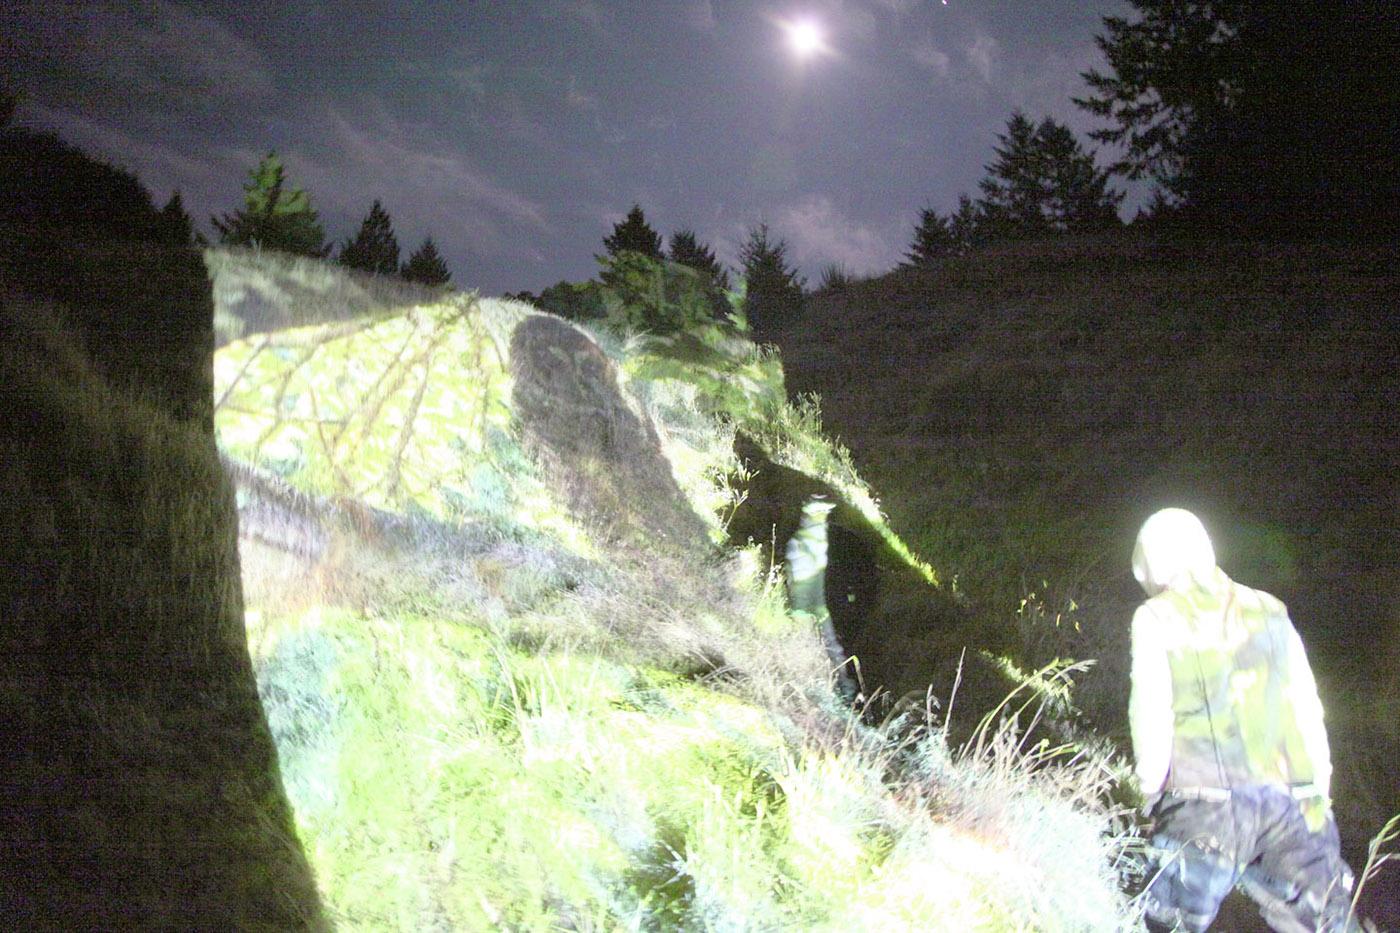 Aeleveneleventmoonlight